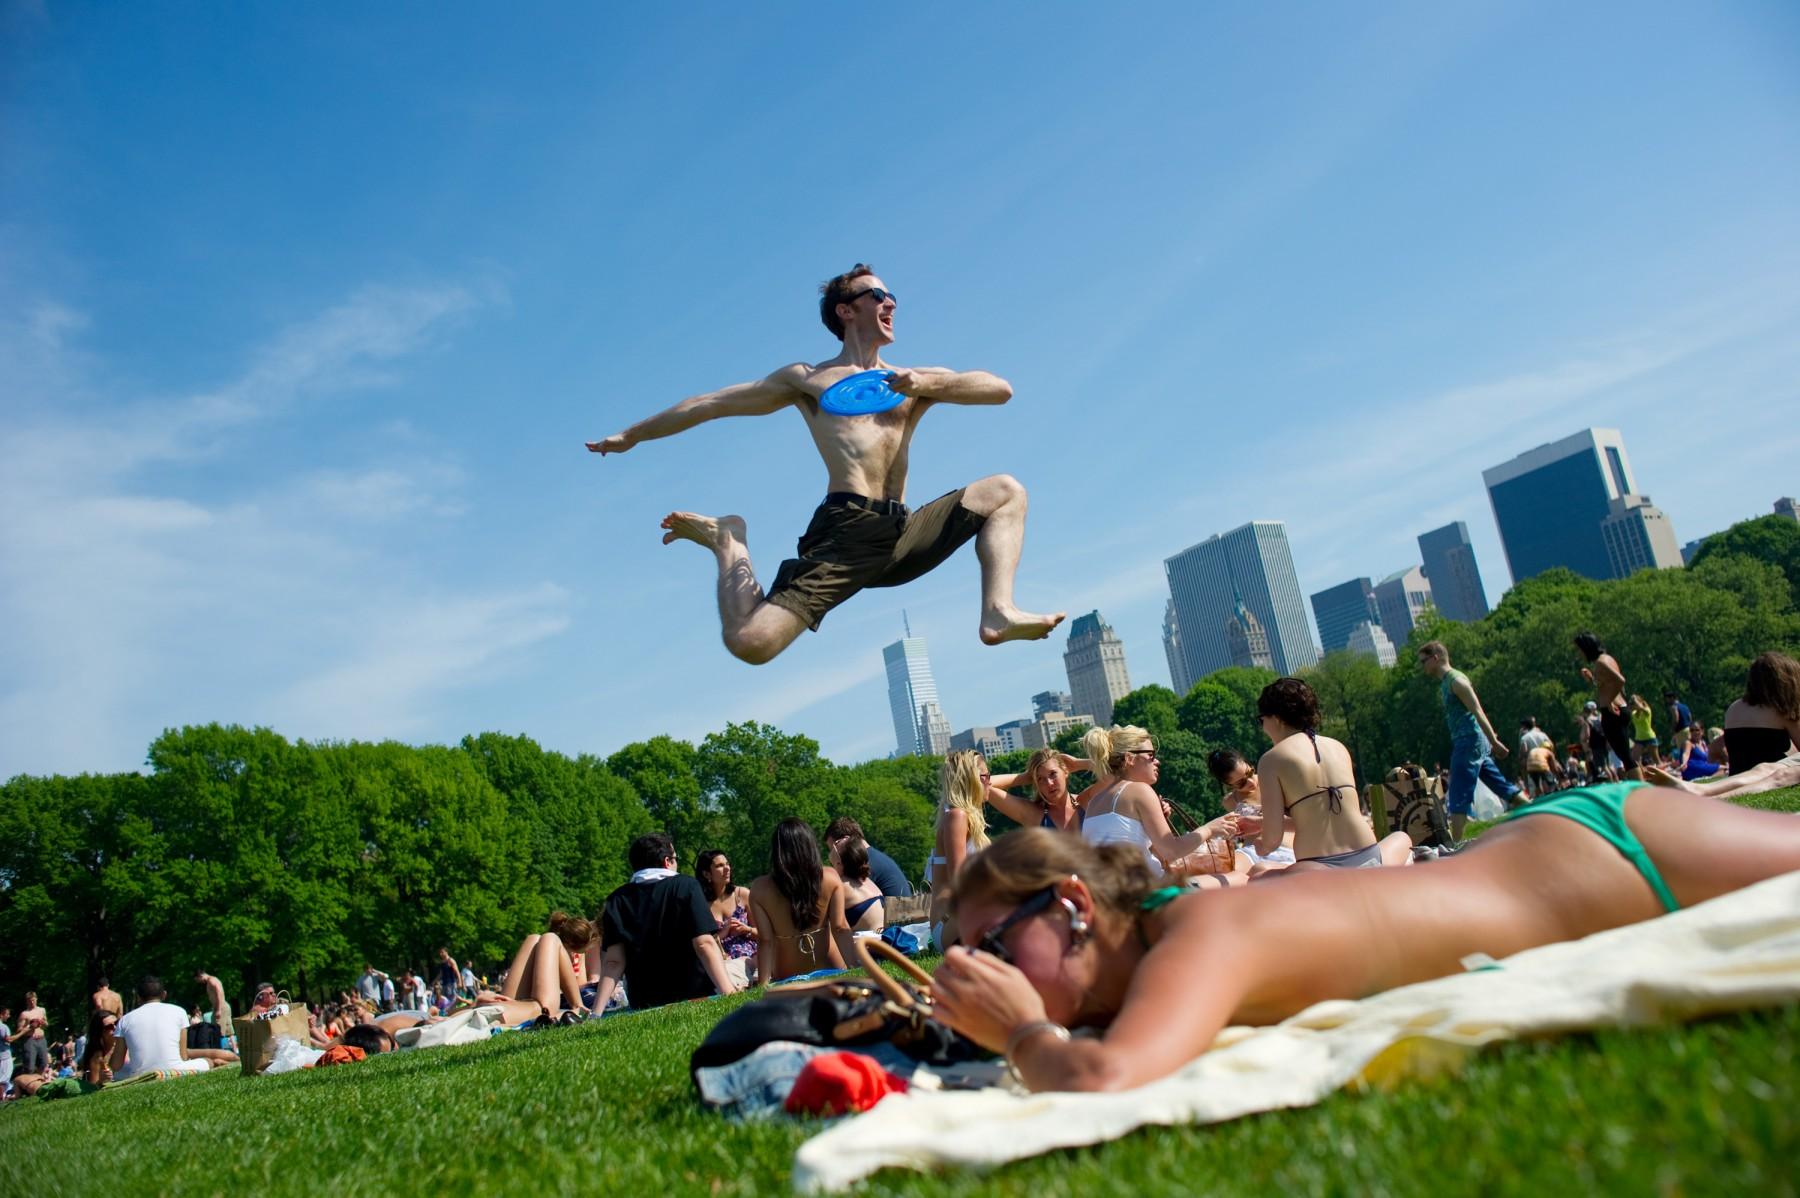 Dancers-Among-Us-in-Central-Park-John-Heginbotham